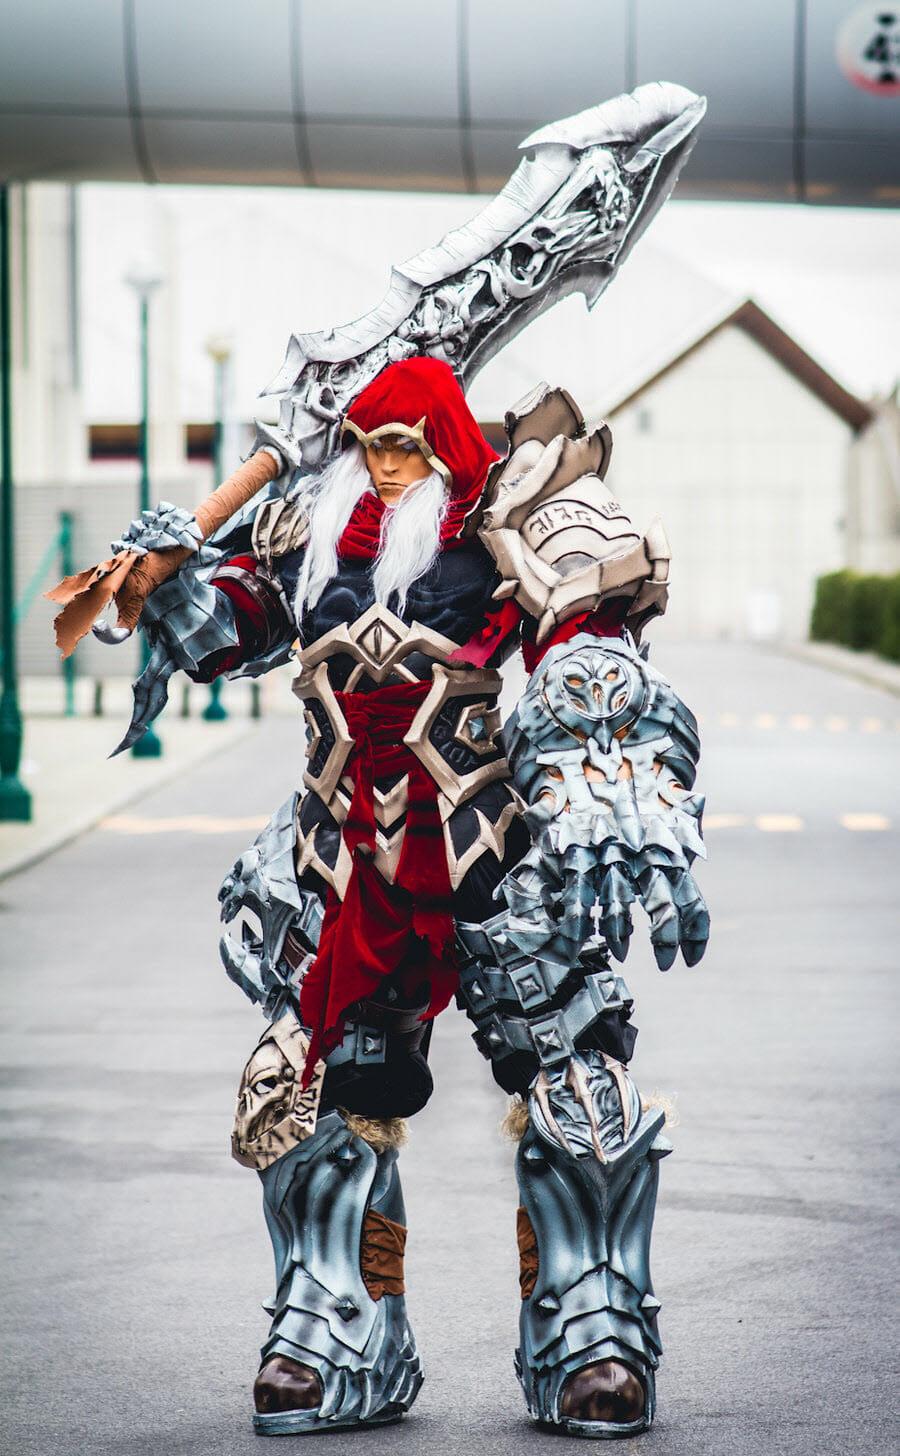 War cosplay from Darksiders